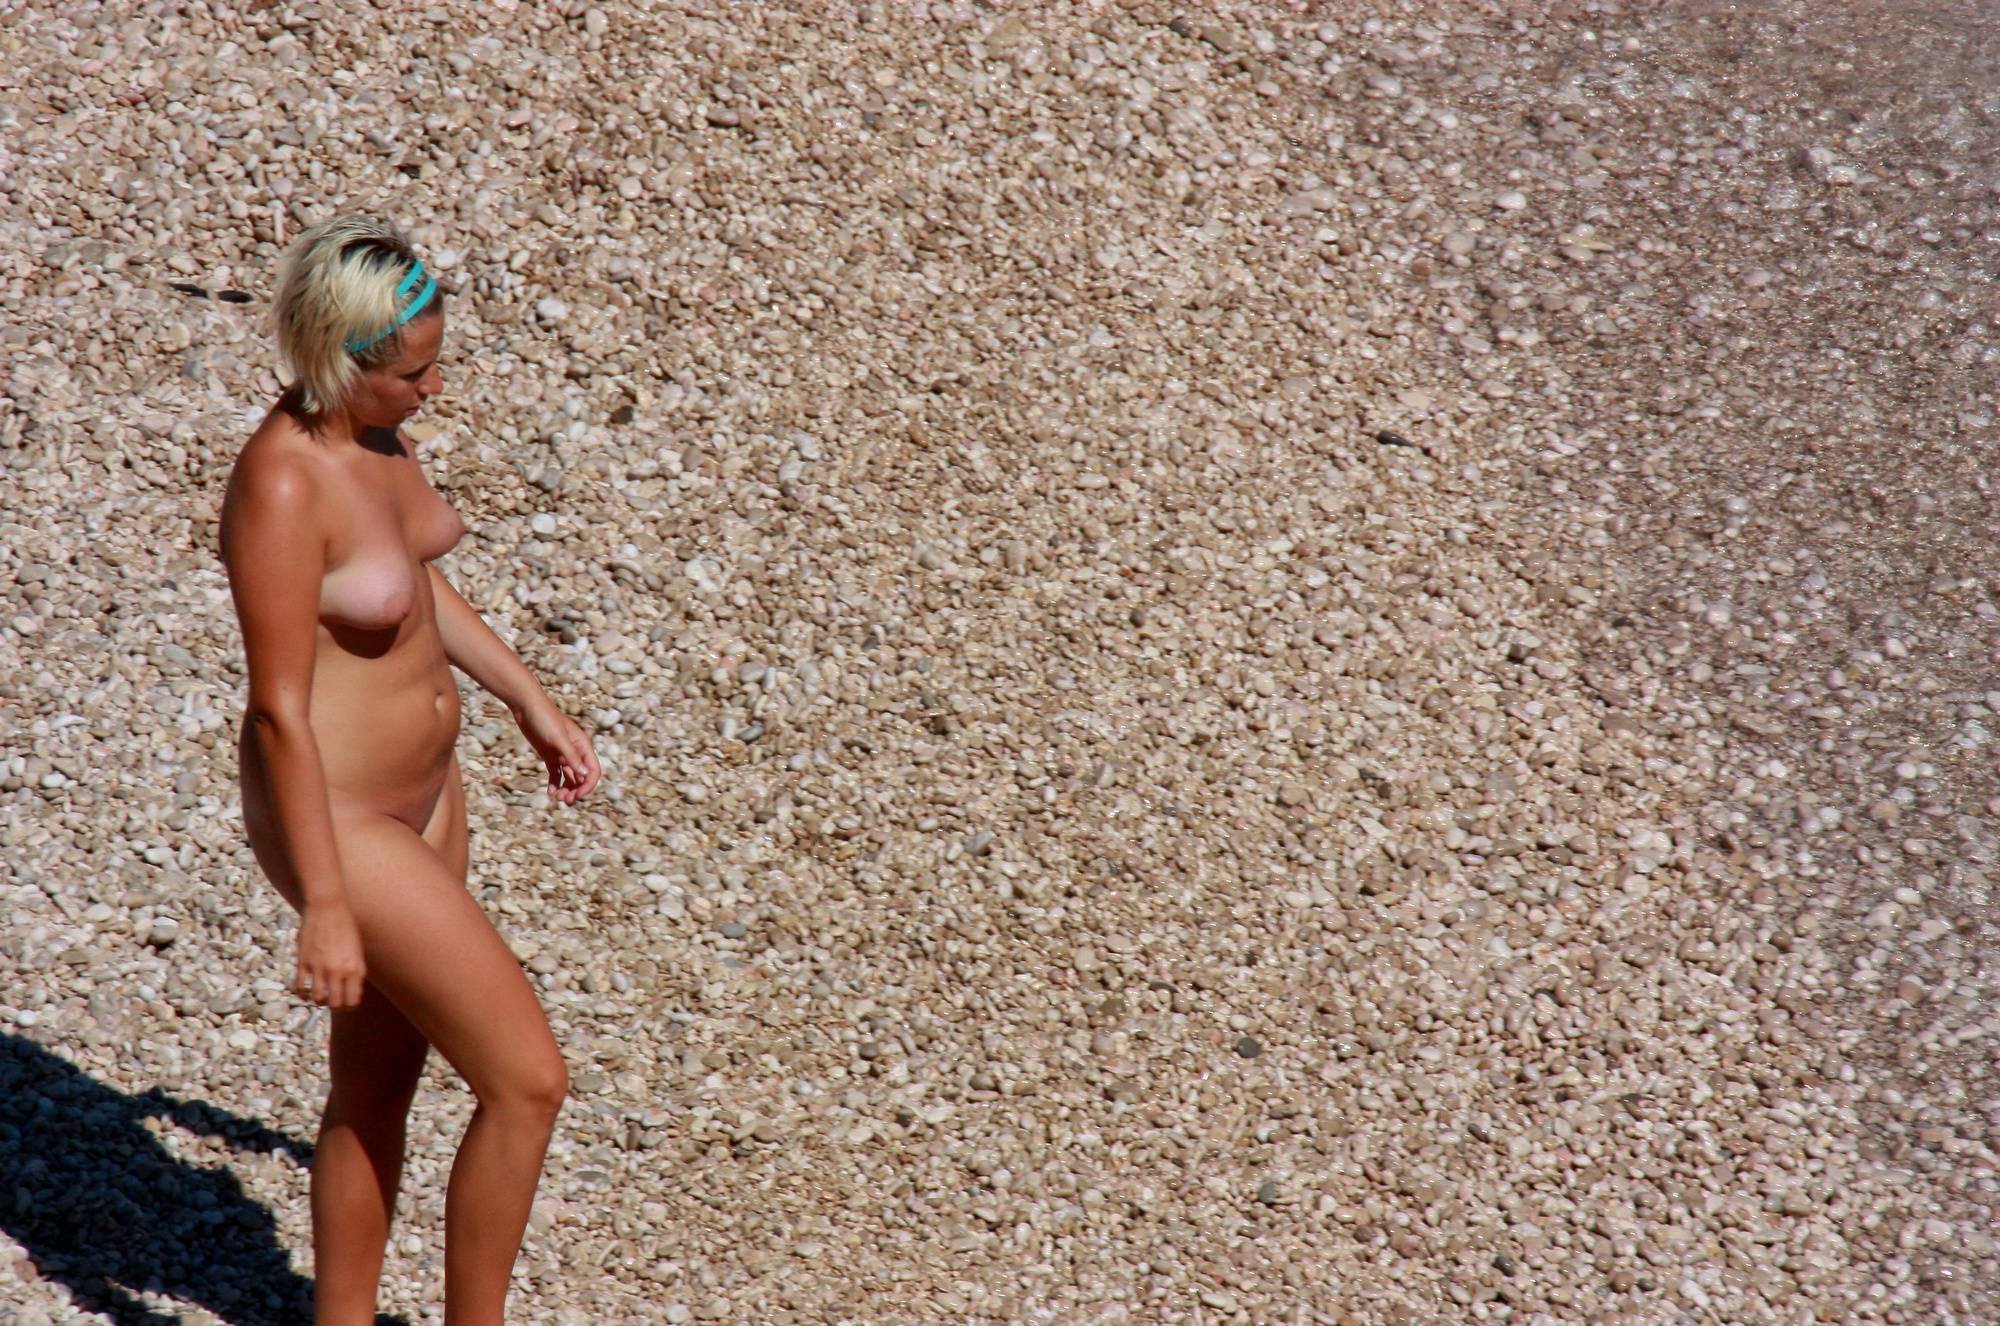 Purenudism Photos-Two Girl Friends on Beach - 1